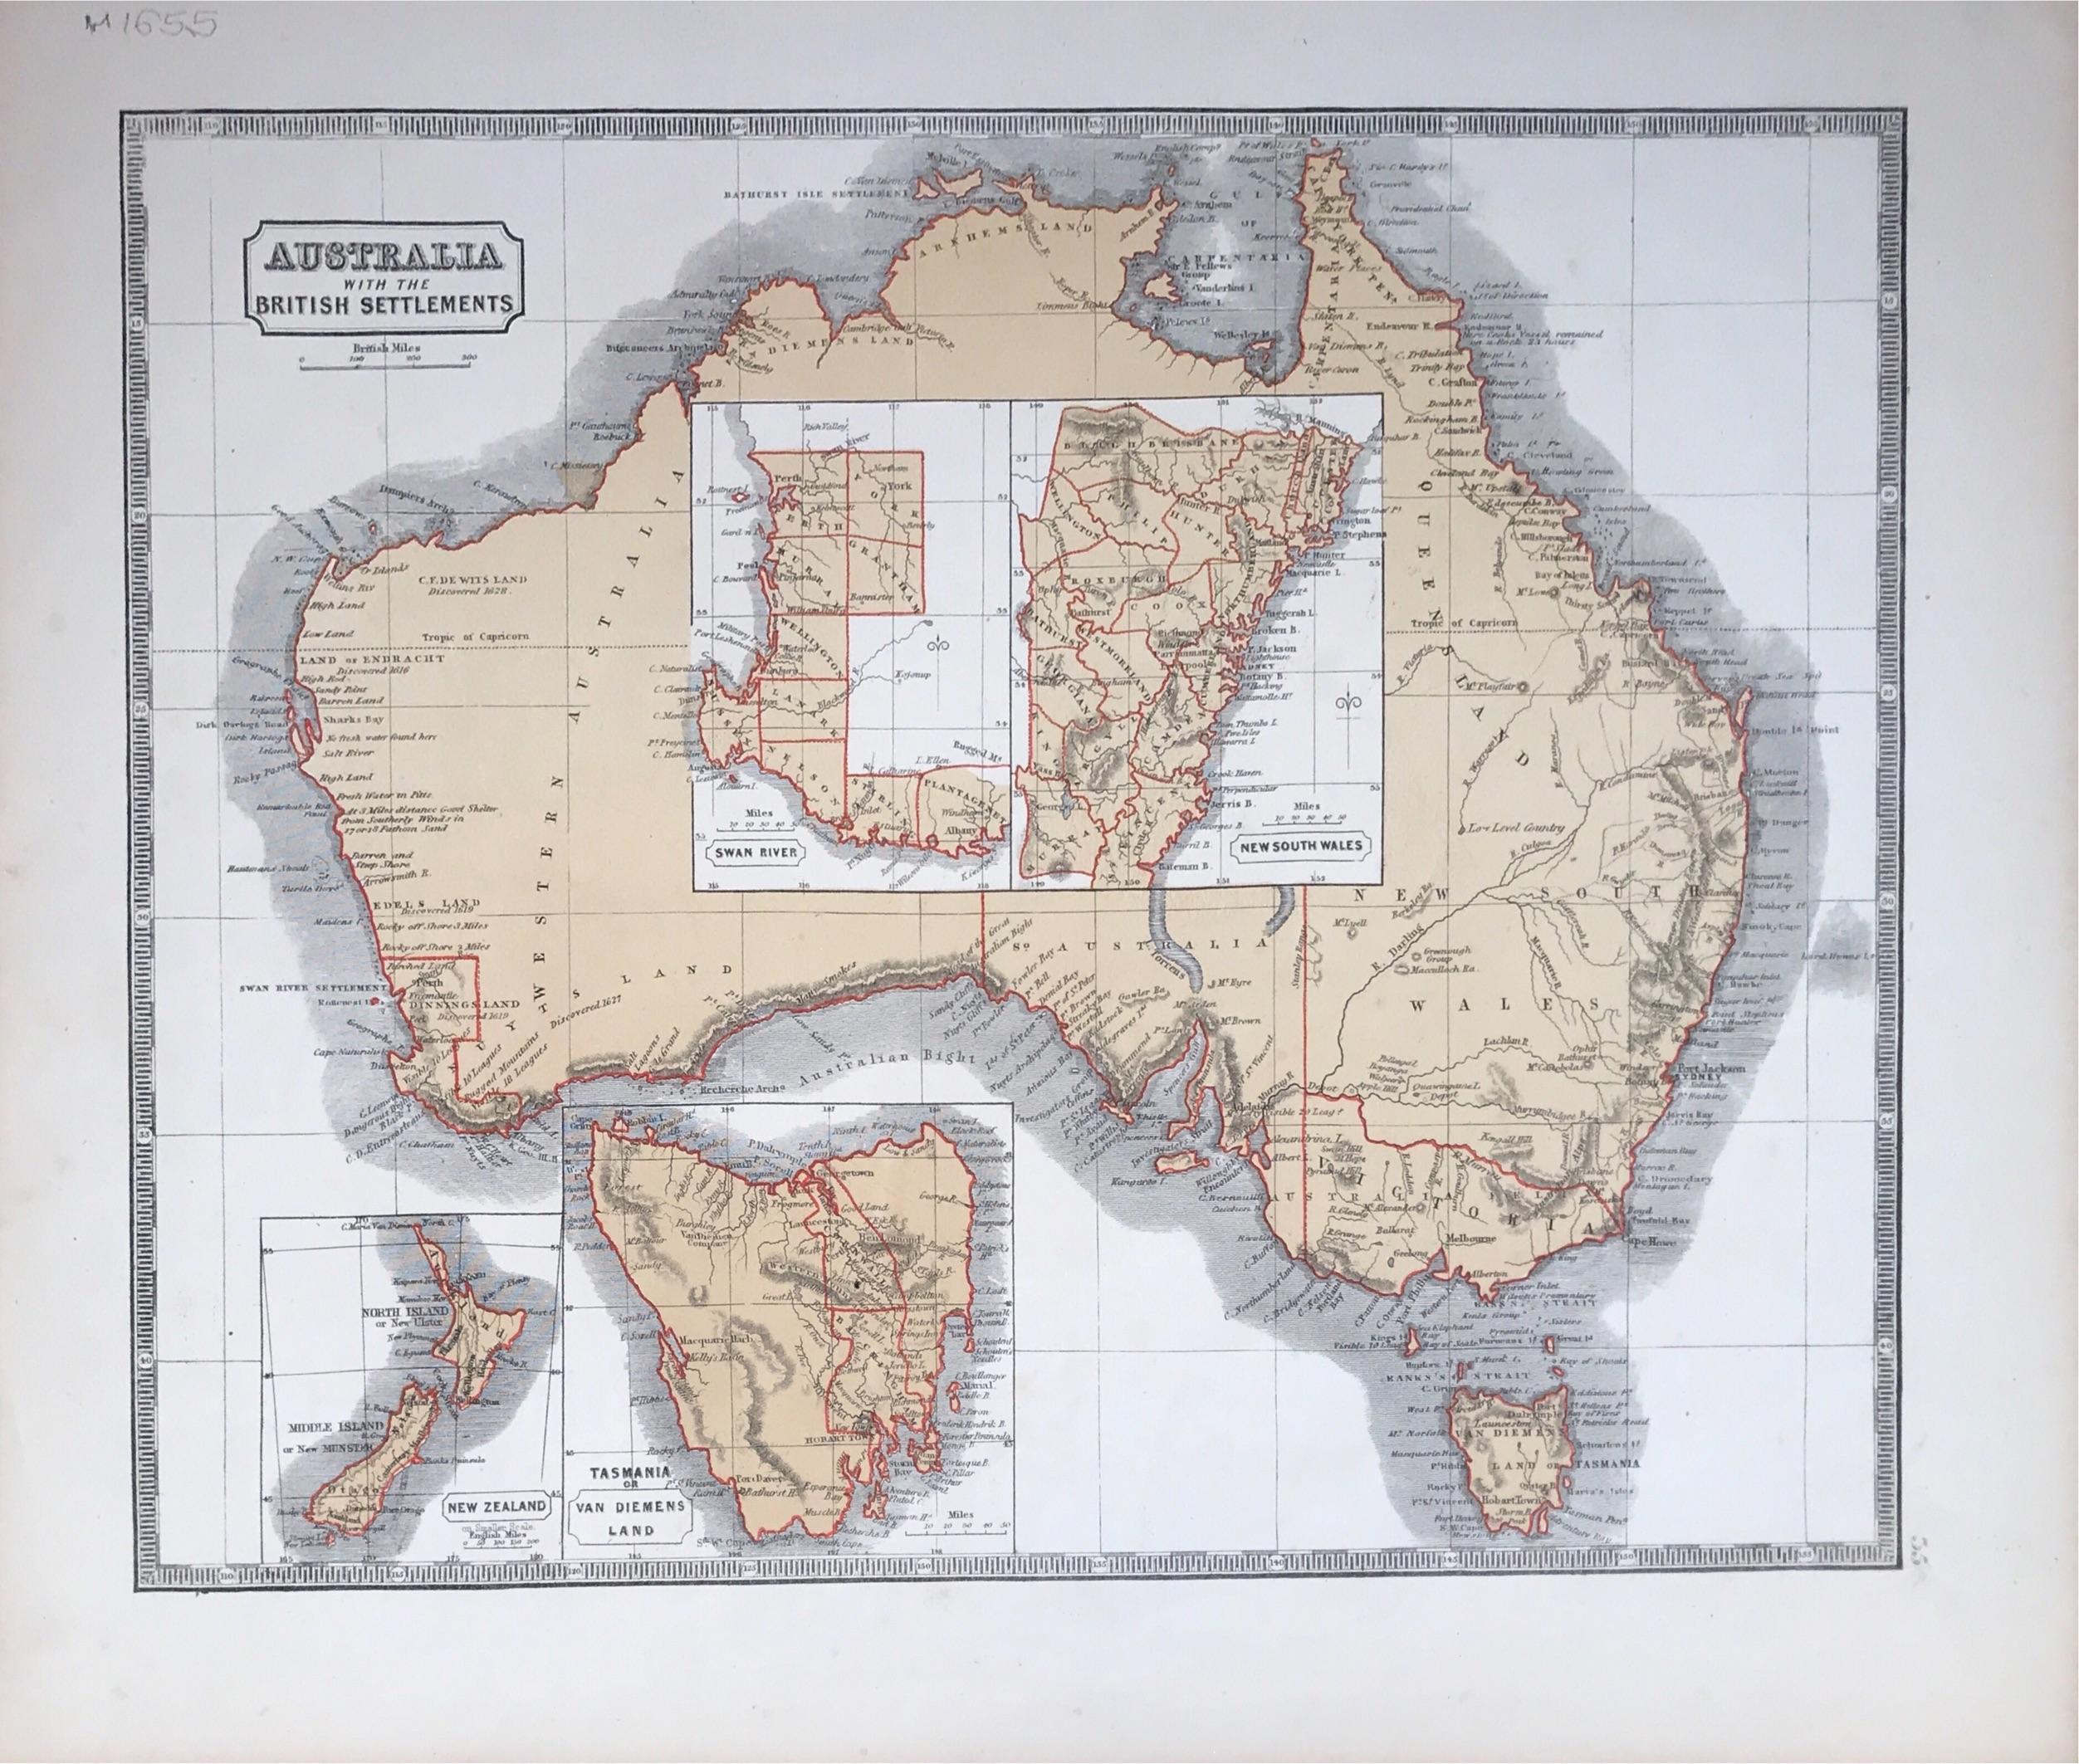 British Settlements in Australia